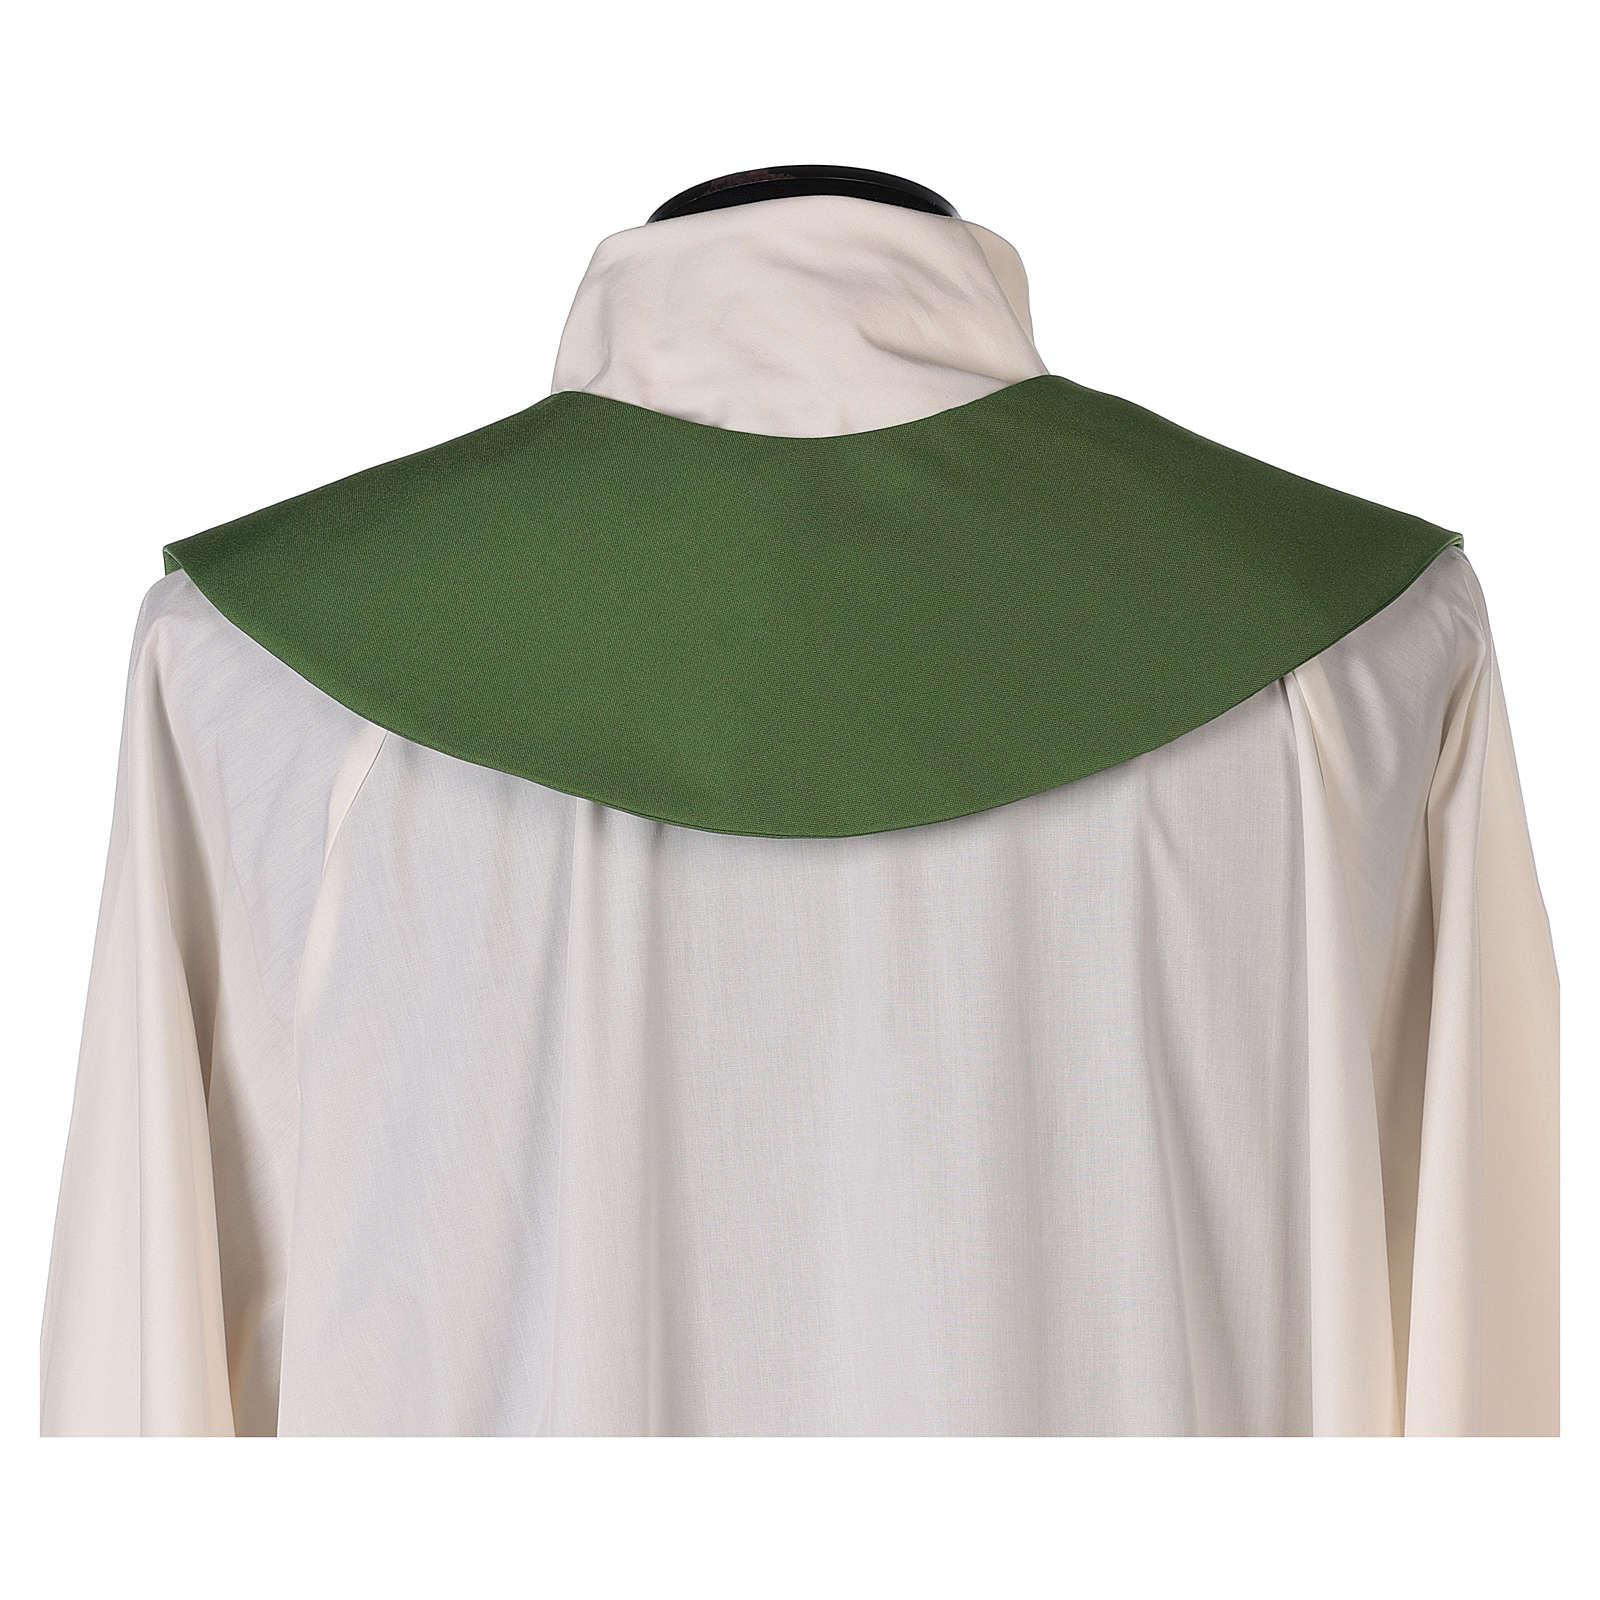 Stolone 100% poliestere croce spiga 4